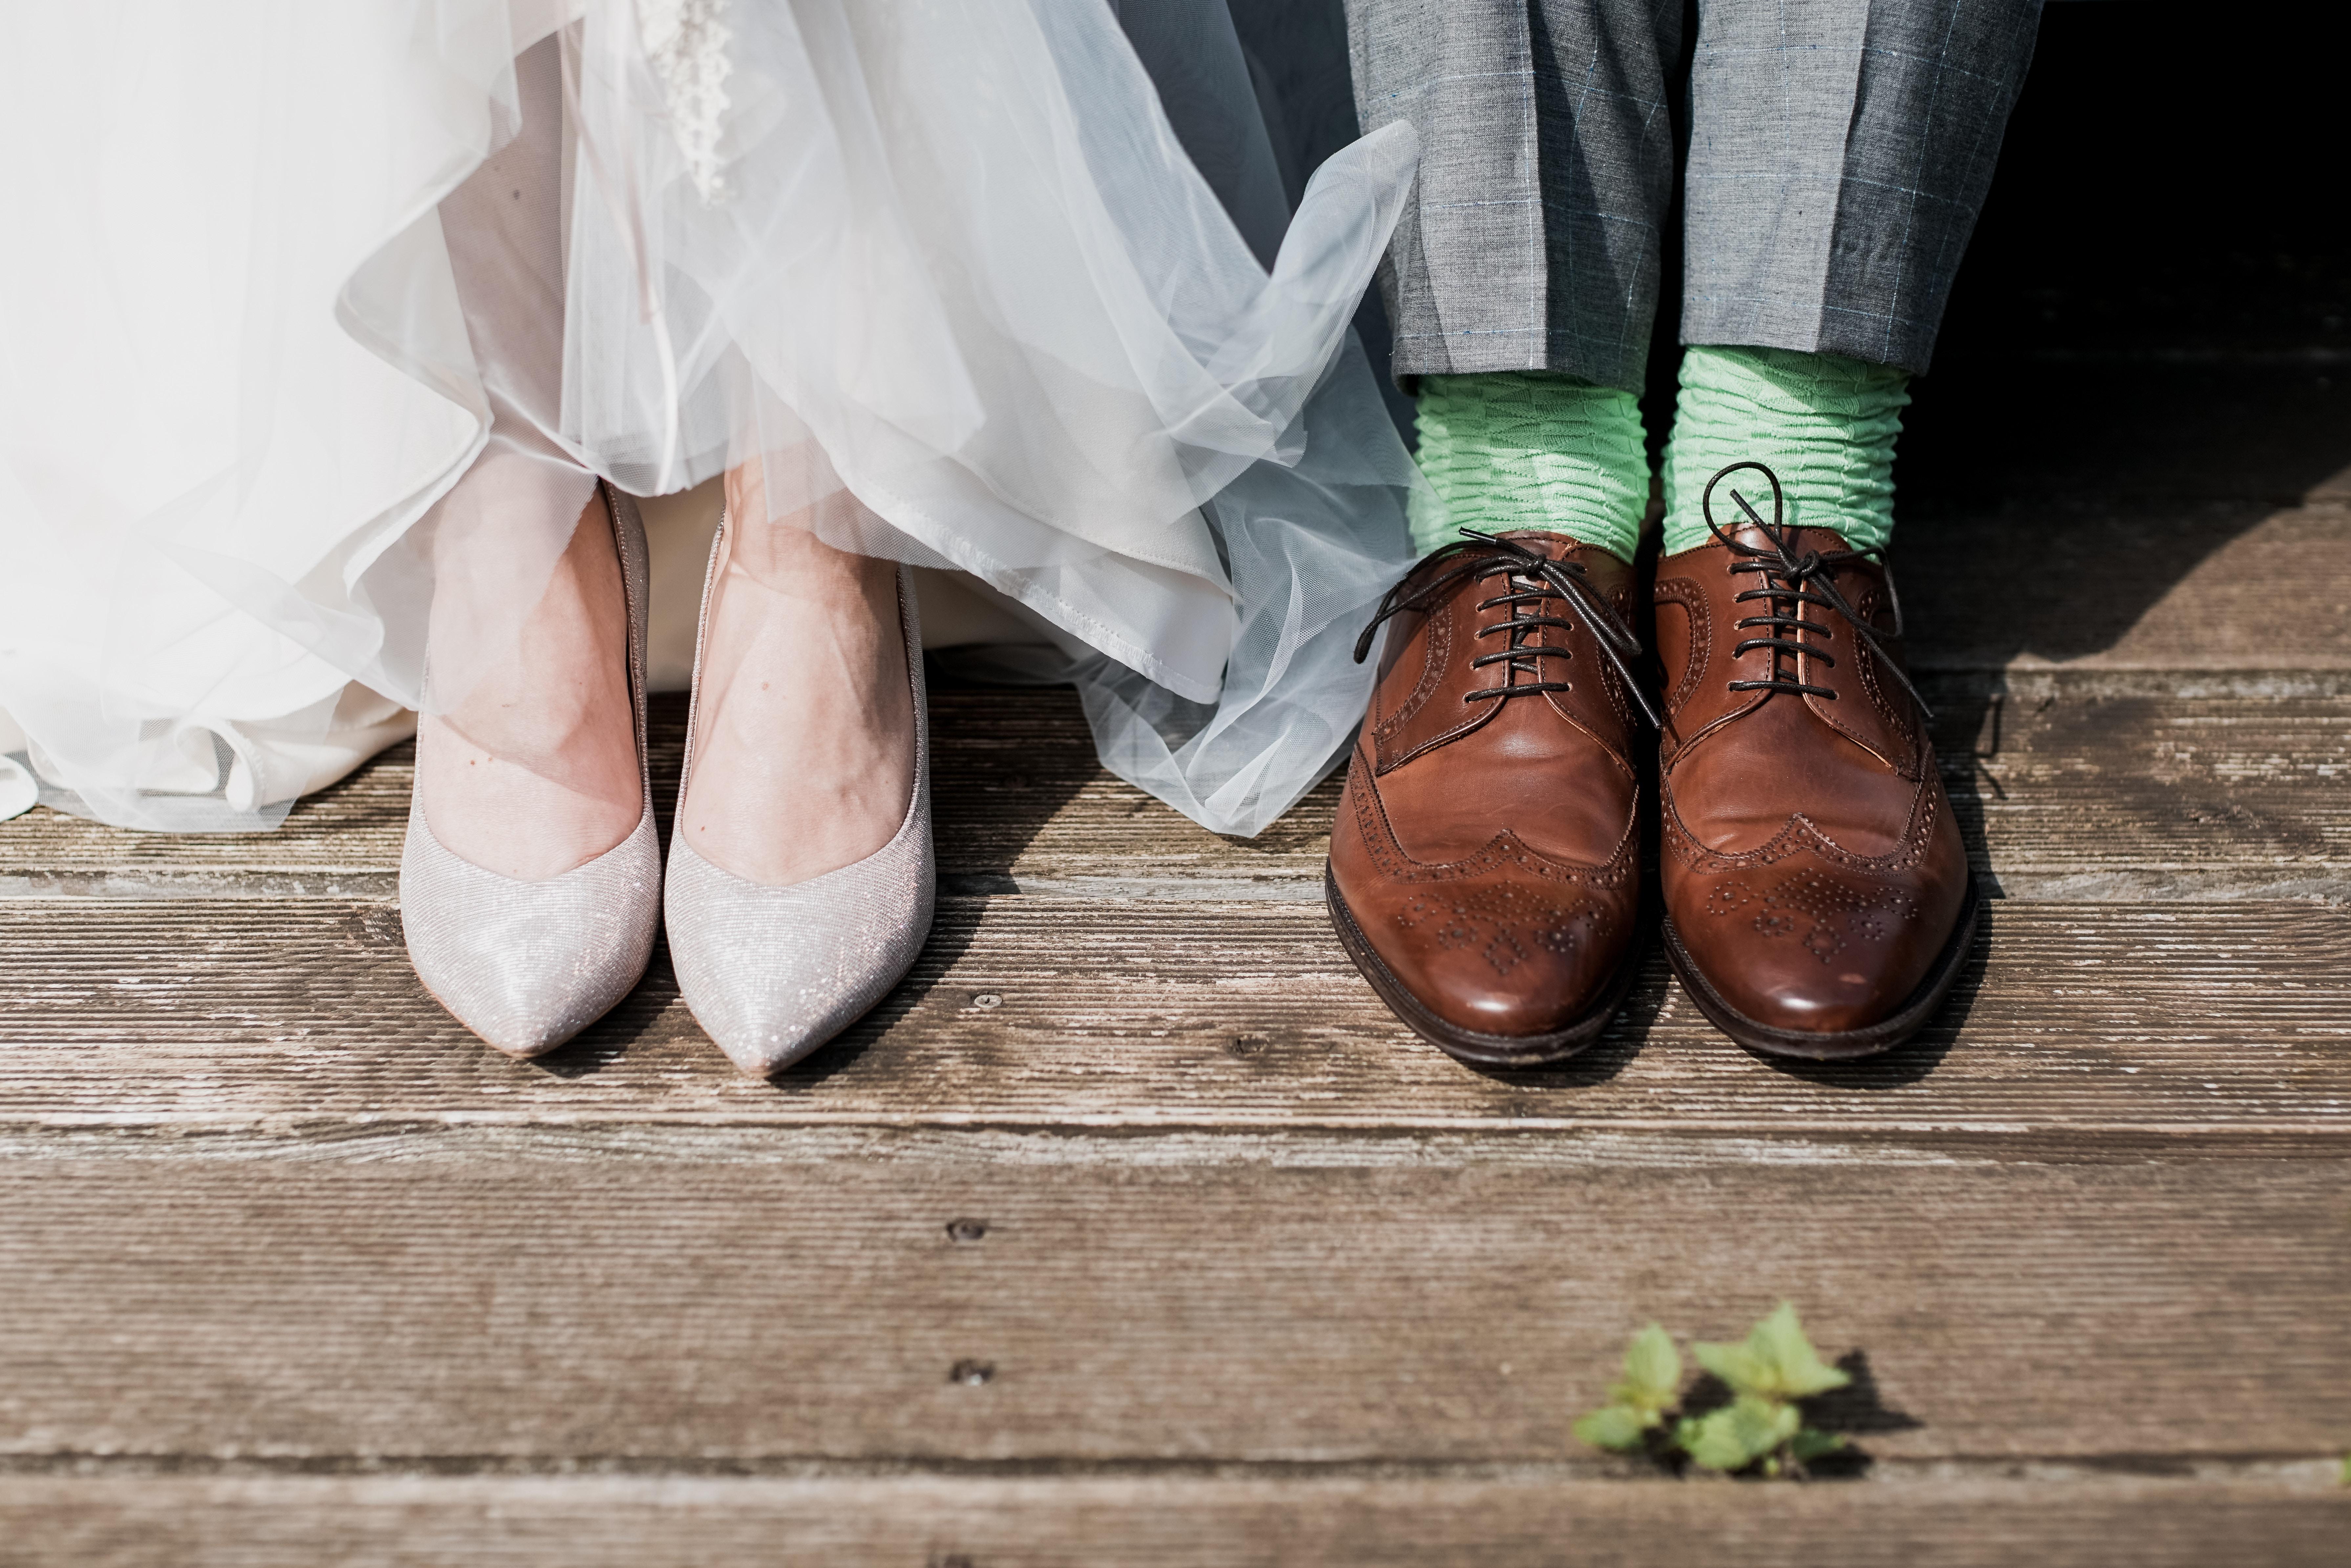 Bride and Groom Wedding Photo Inspiration